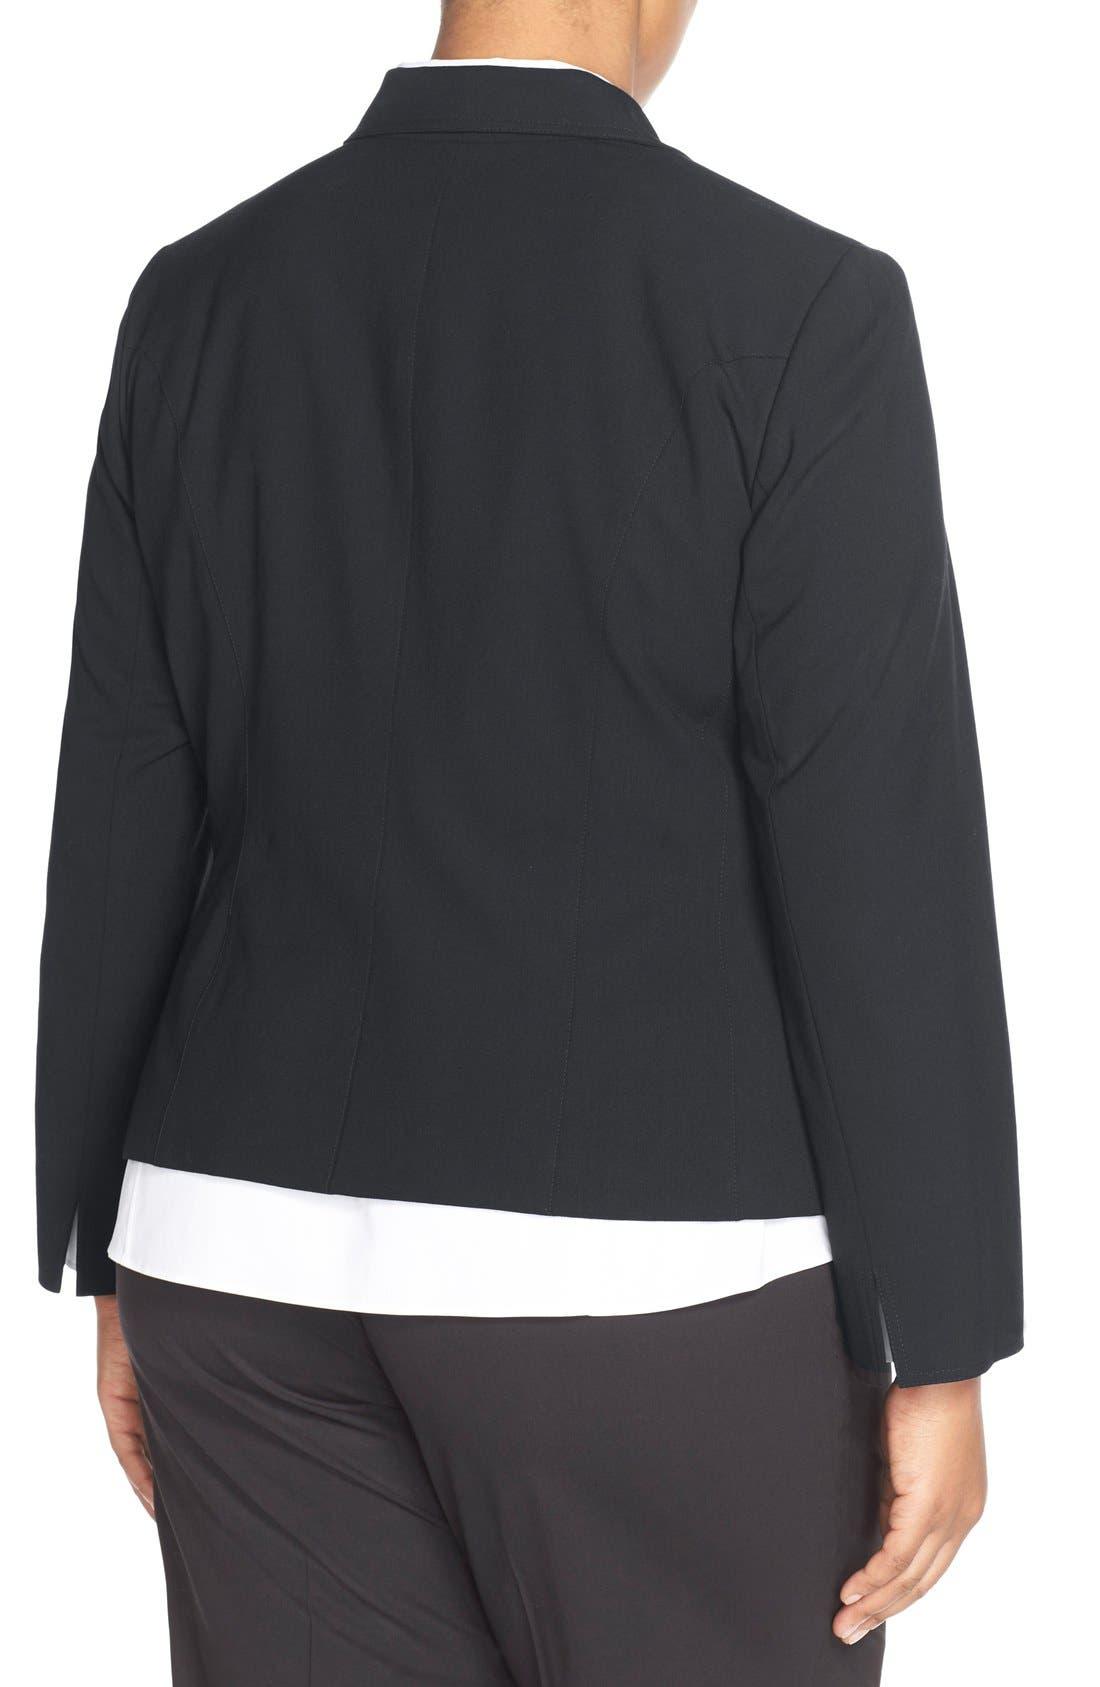 'Gladstone' Stretch Wool Jacket,                             Alternate thumbnail 2, color,                             NAVY